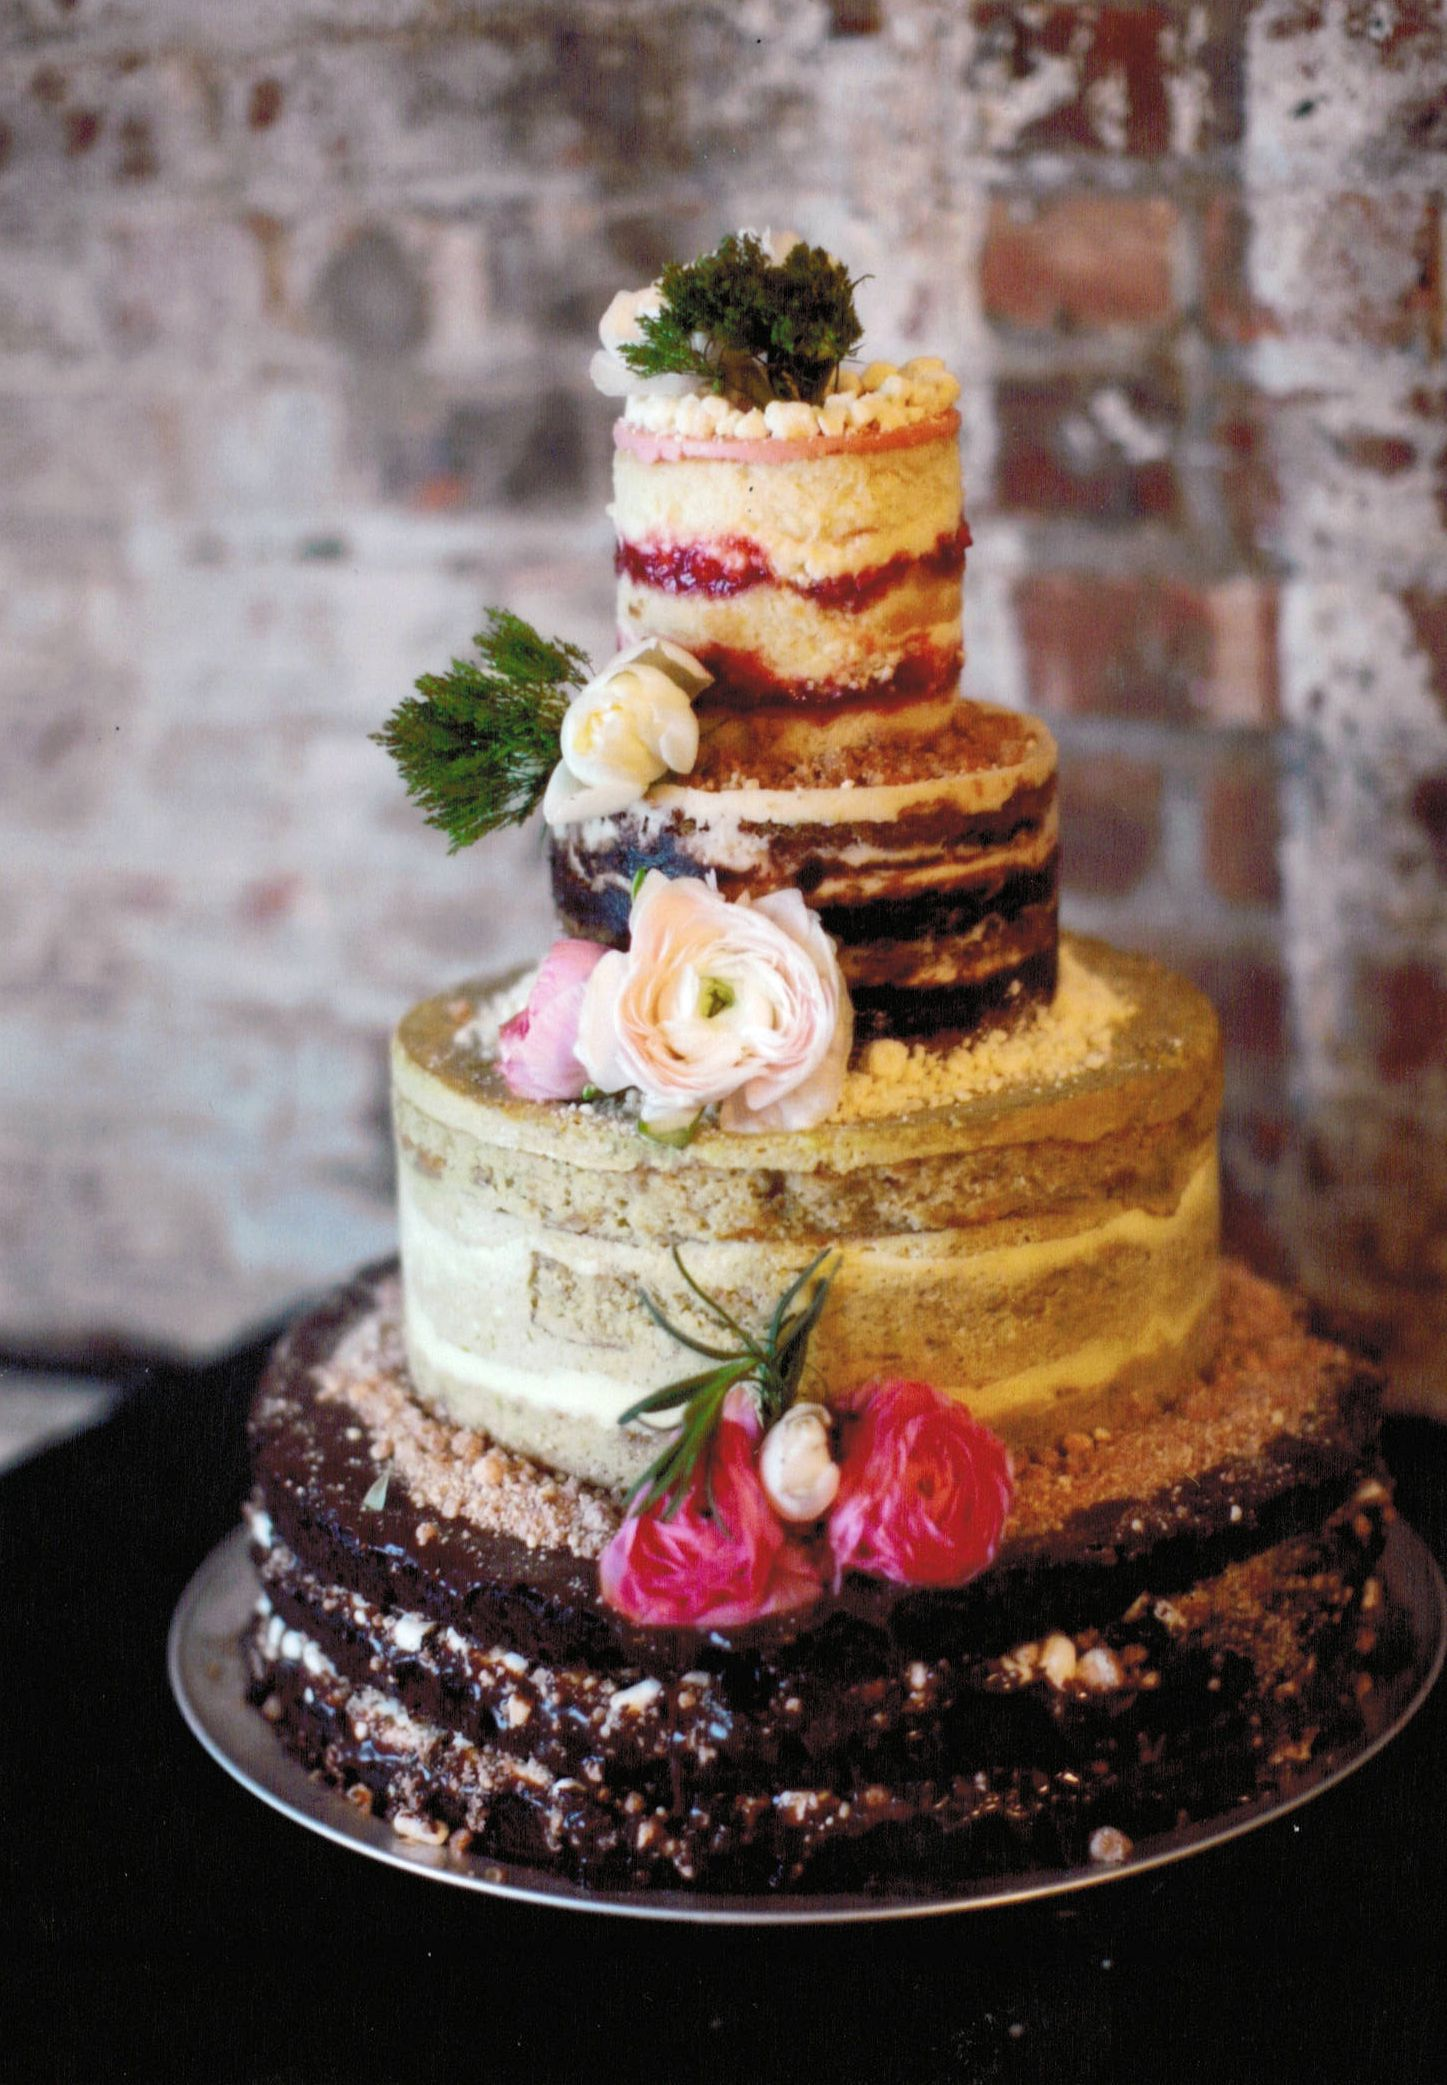 Hot Trend: Multiple Mini Wedding Cakes